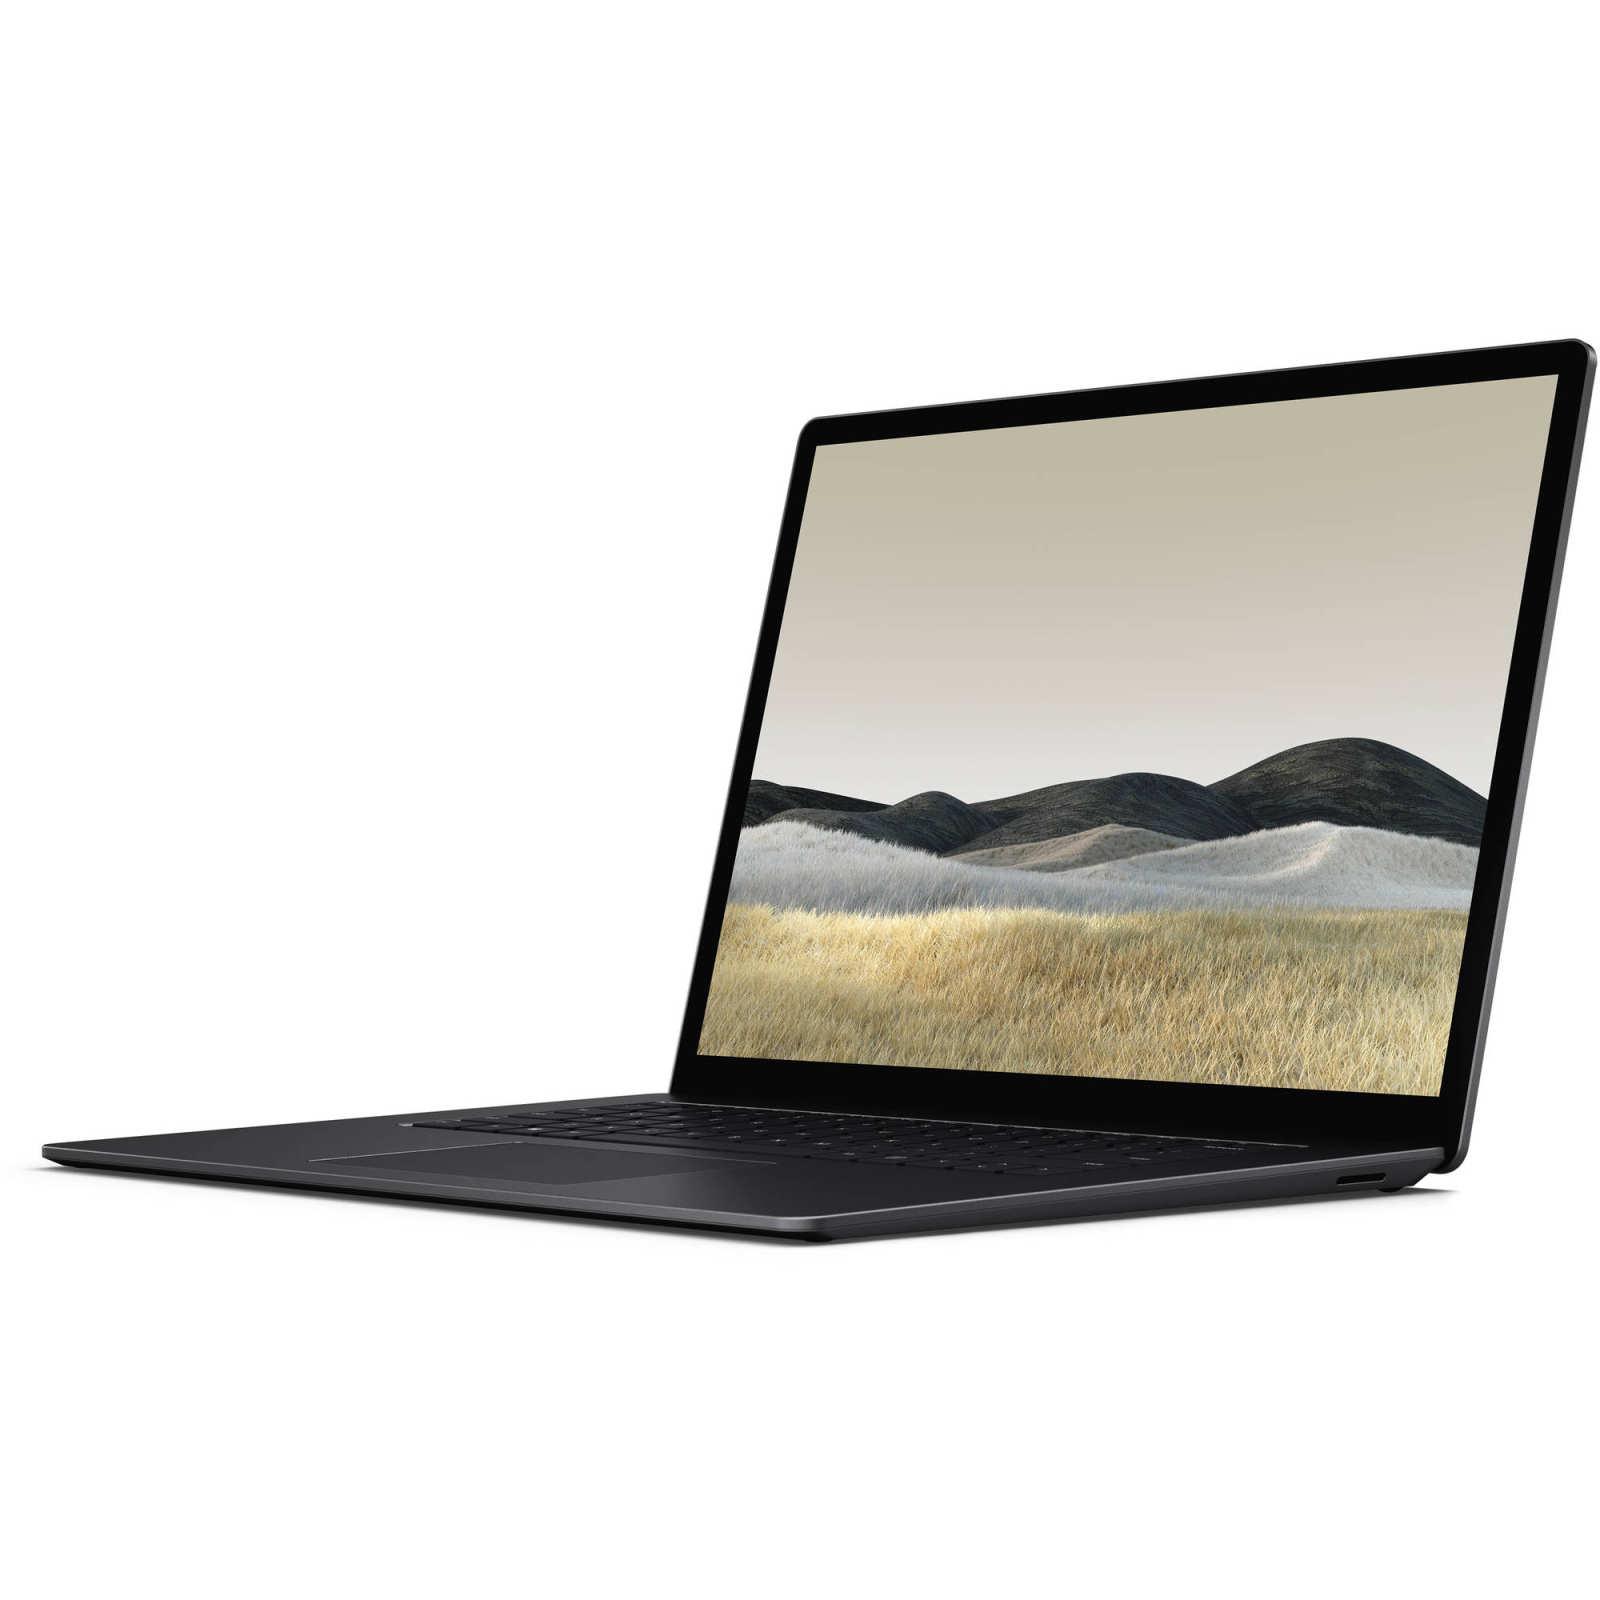 لپ تاپ 15 اینچی مایکروسافت مدل Surface Laptop 3 - B